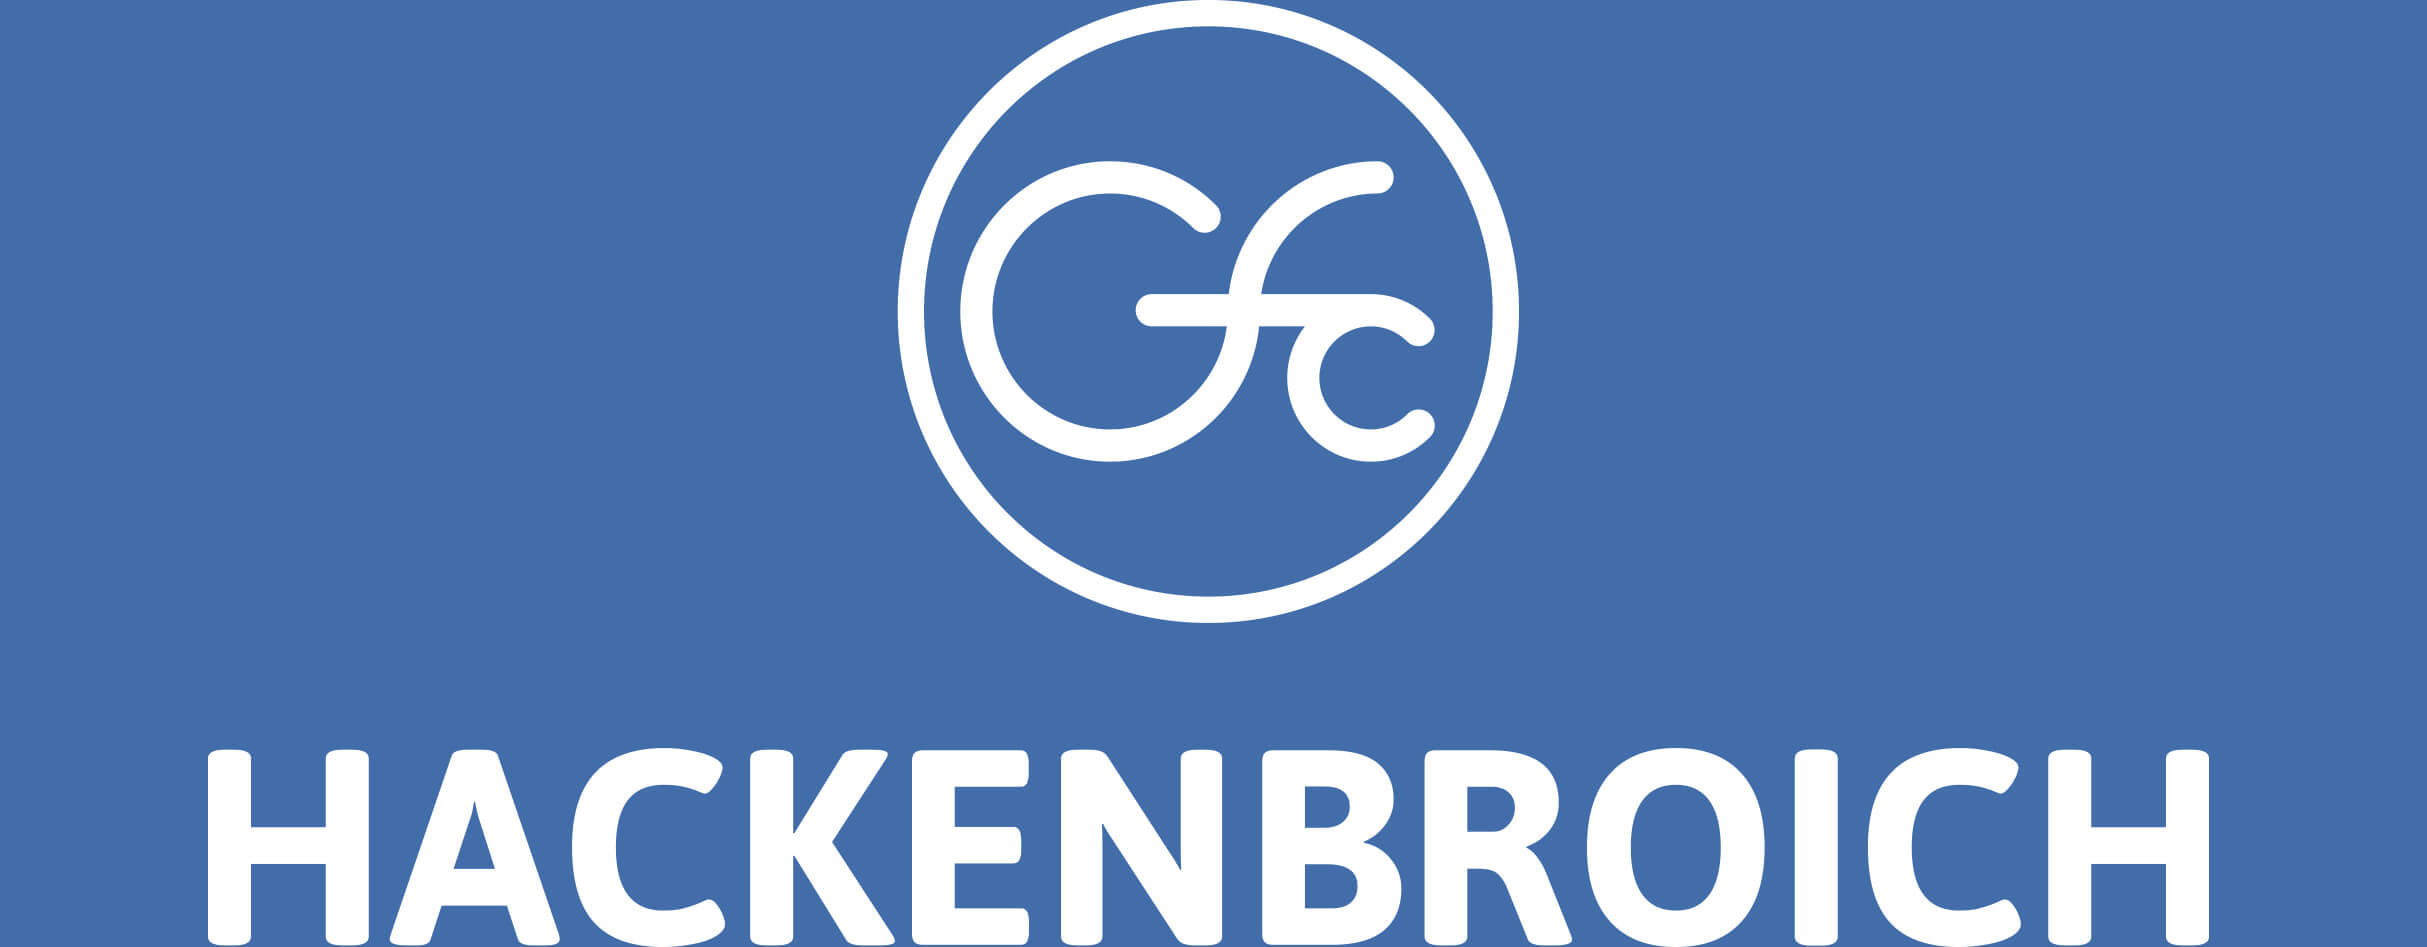 Hackenbroich GmbH Logo